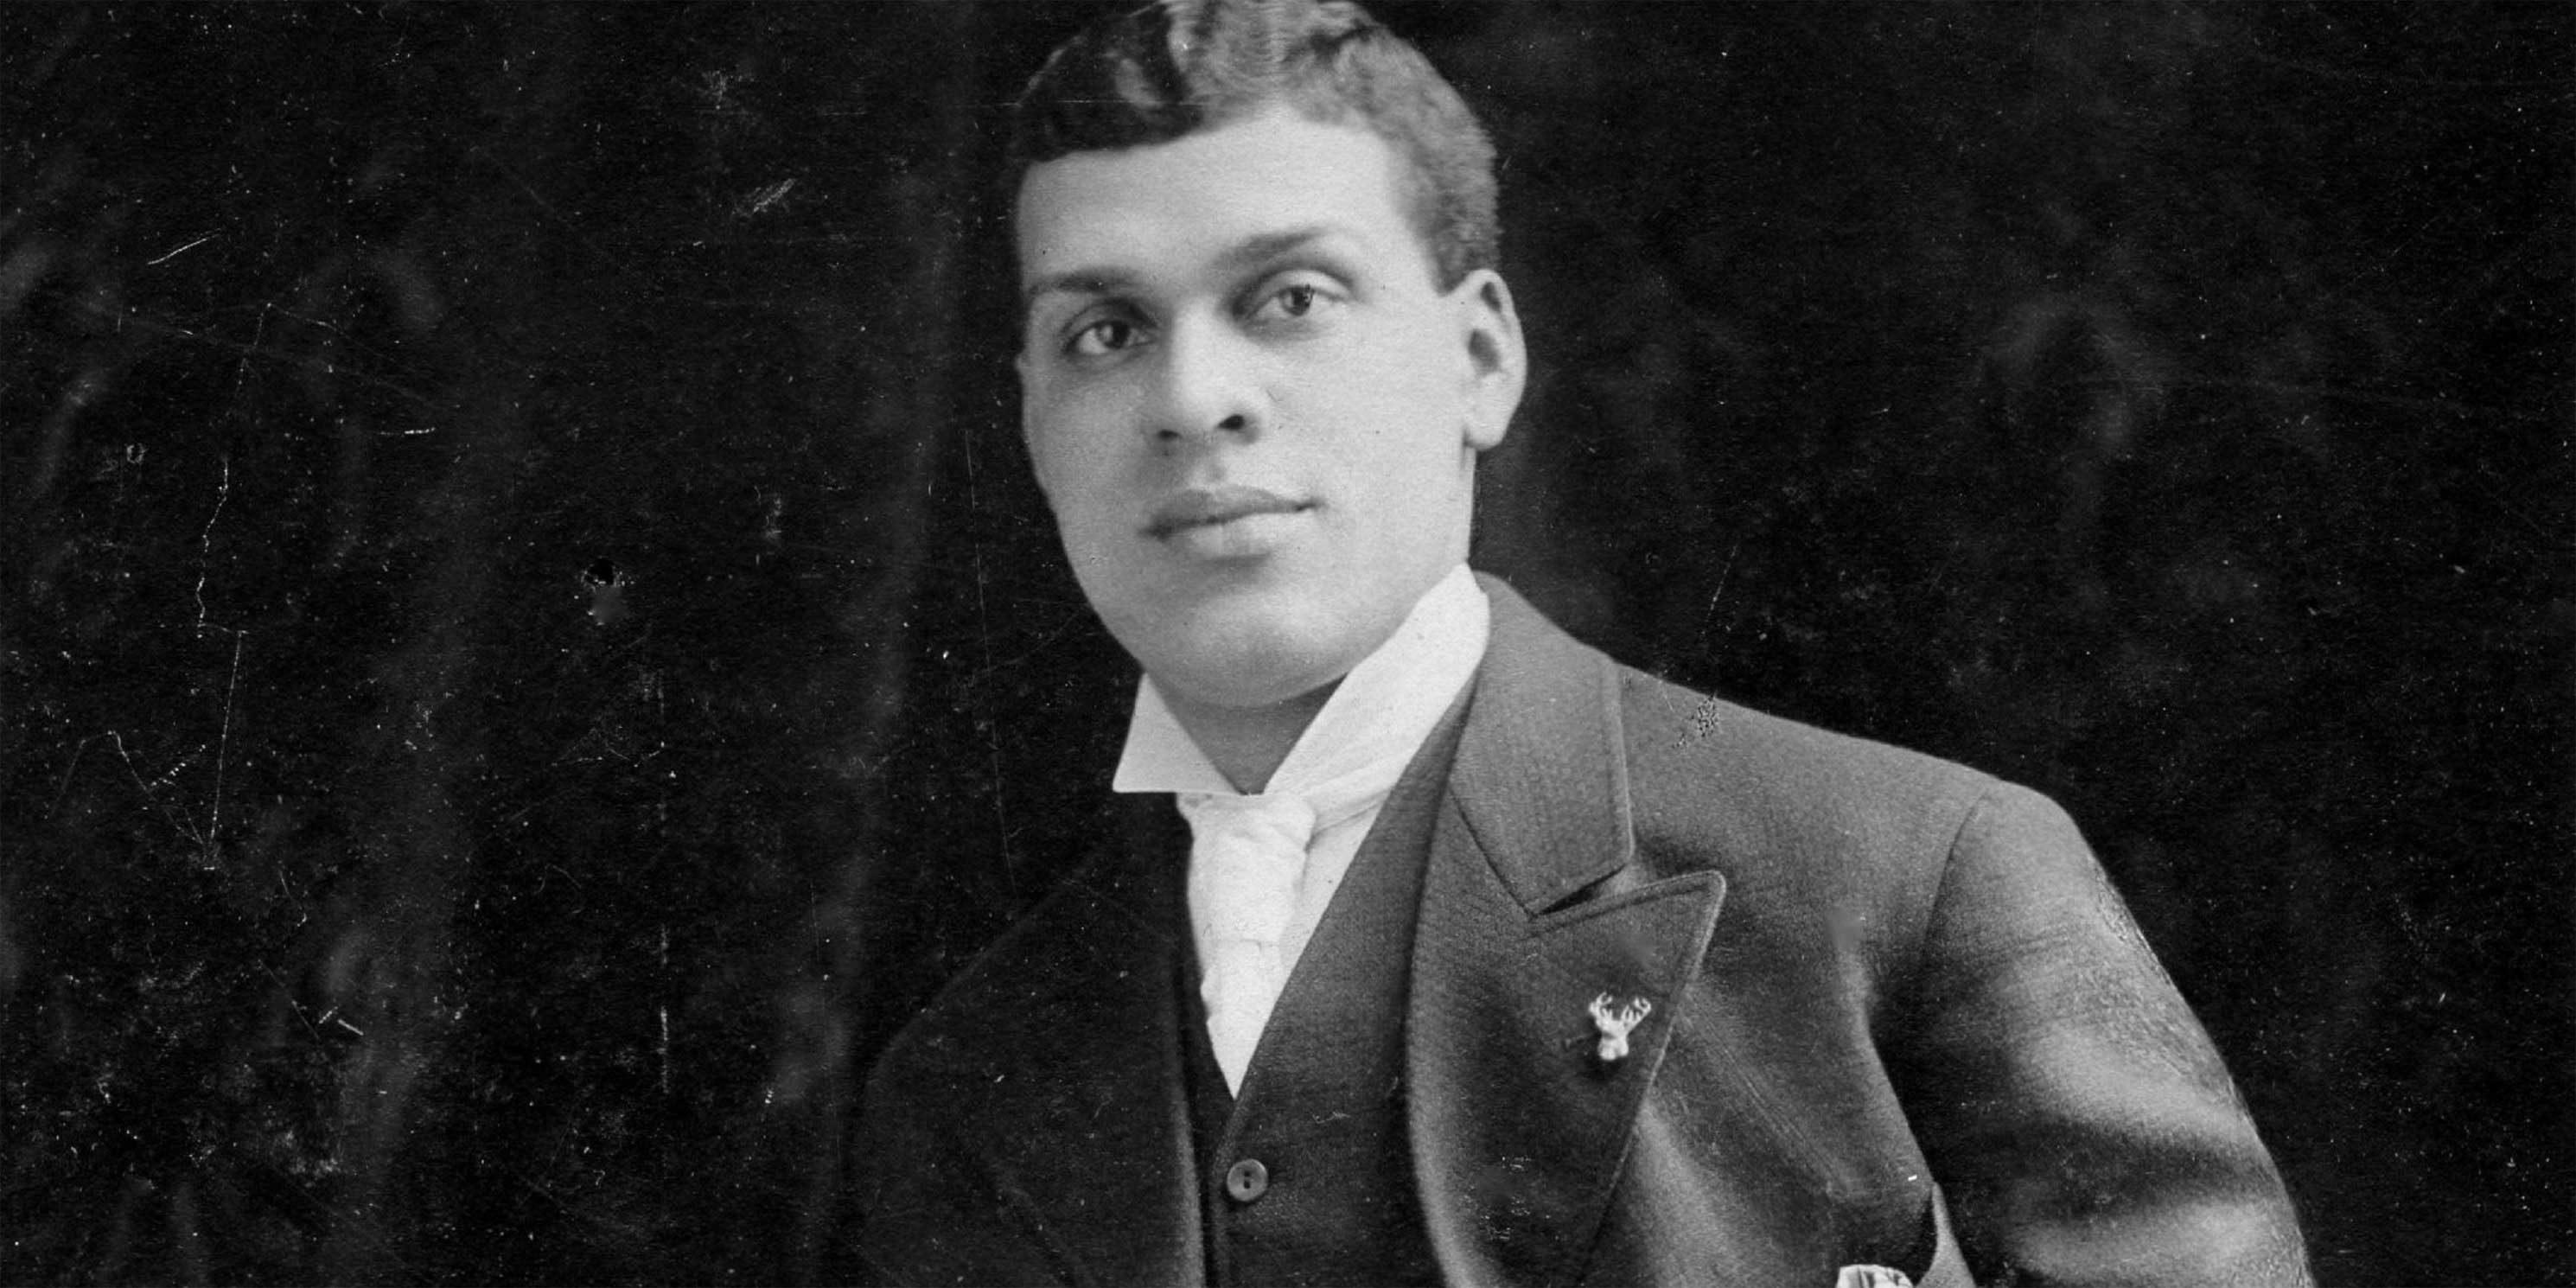 portrait of James H. Williams